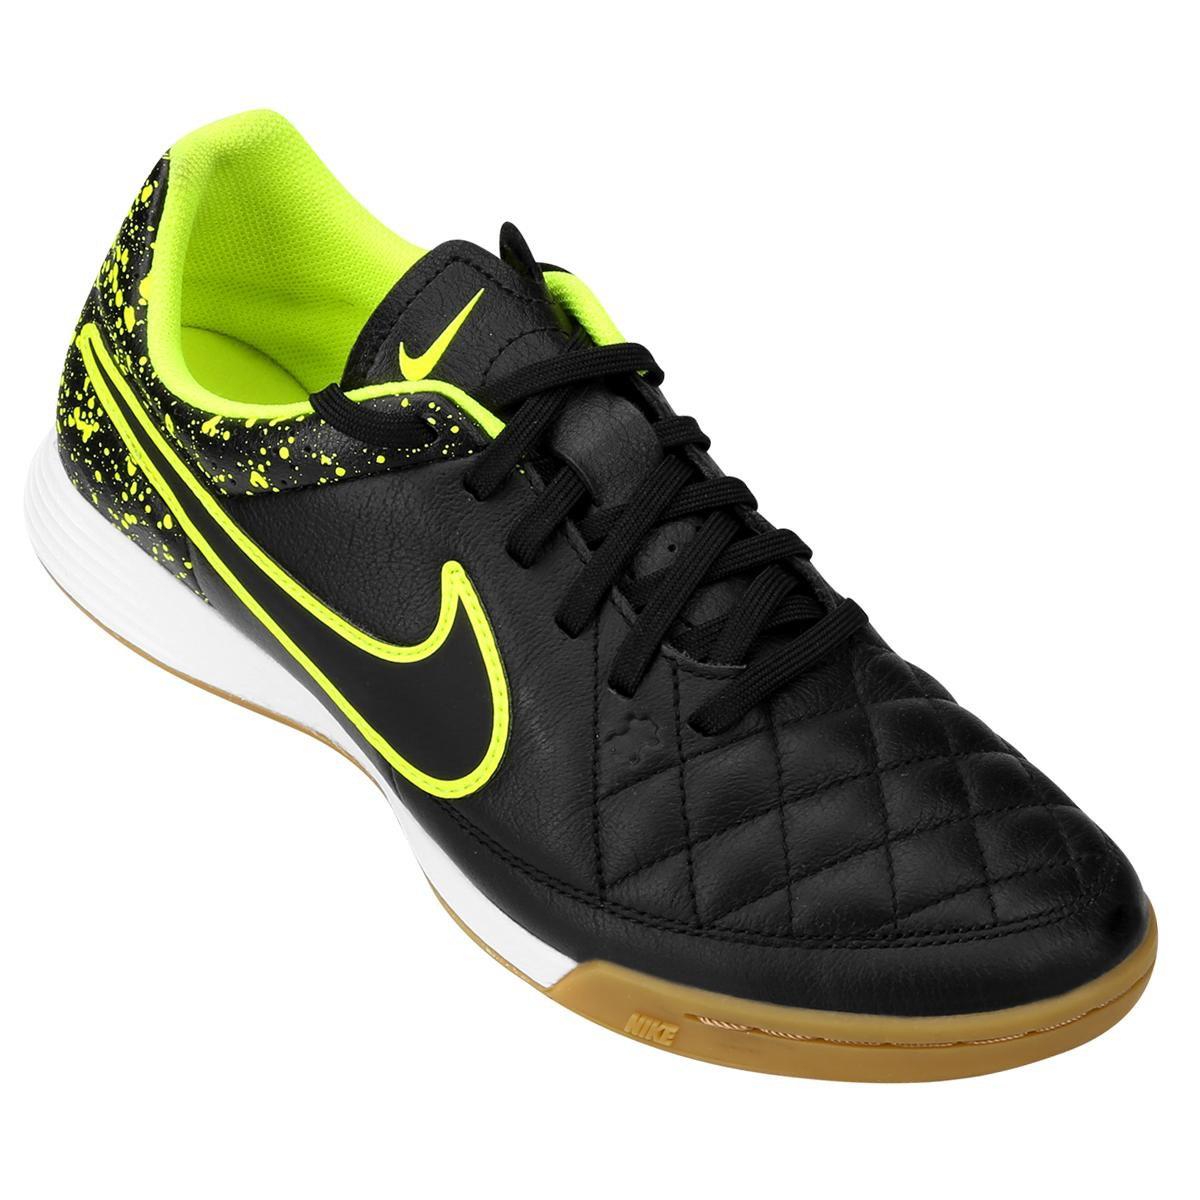 9040d93365 Chuteira Nike Tiempo Gênio Leather IC Futsal - Compre Agora